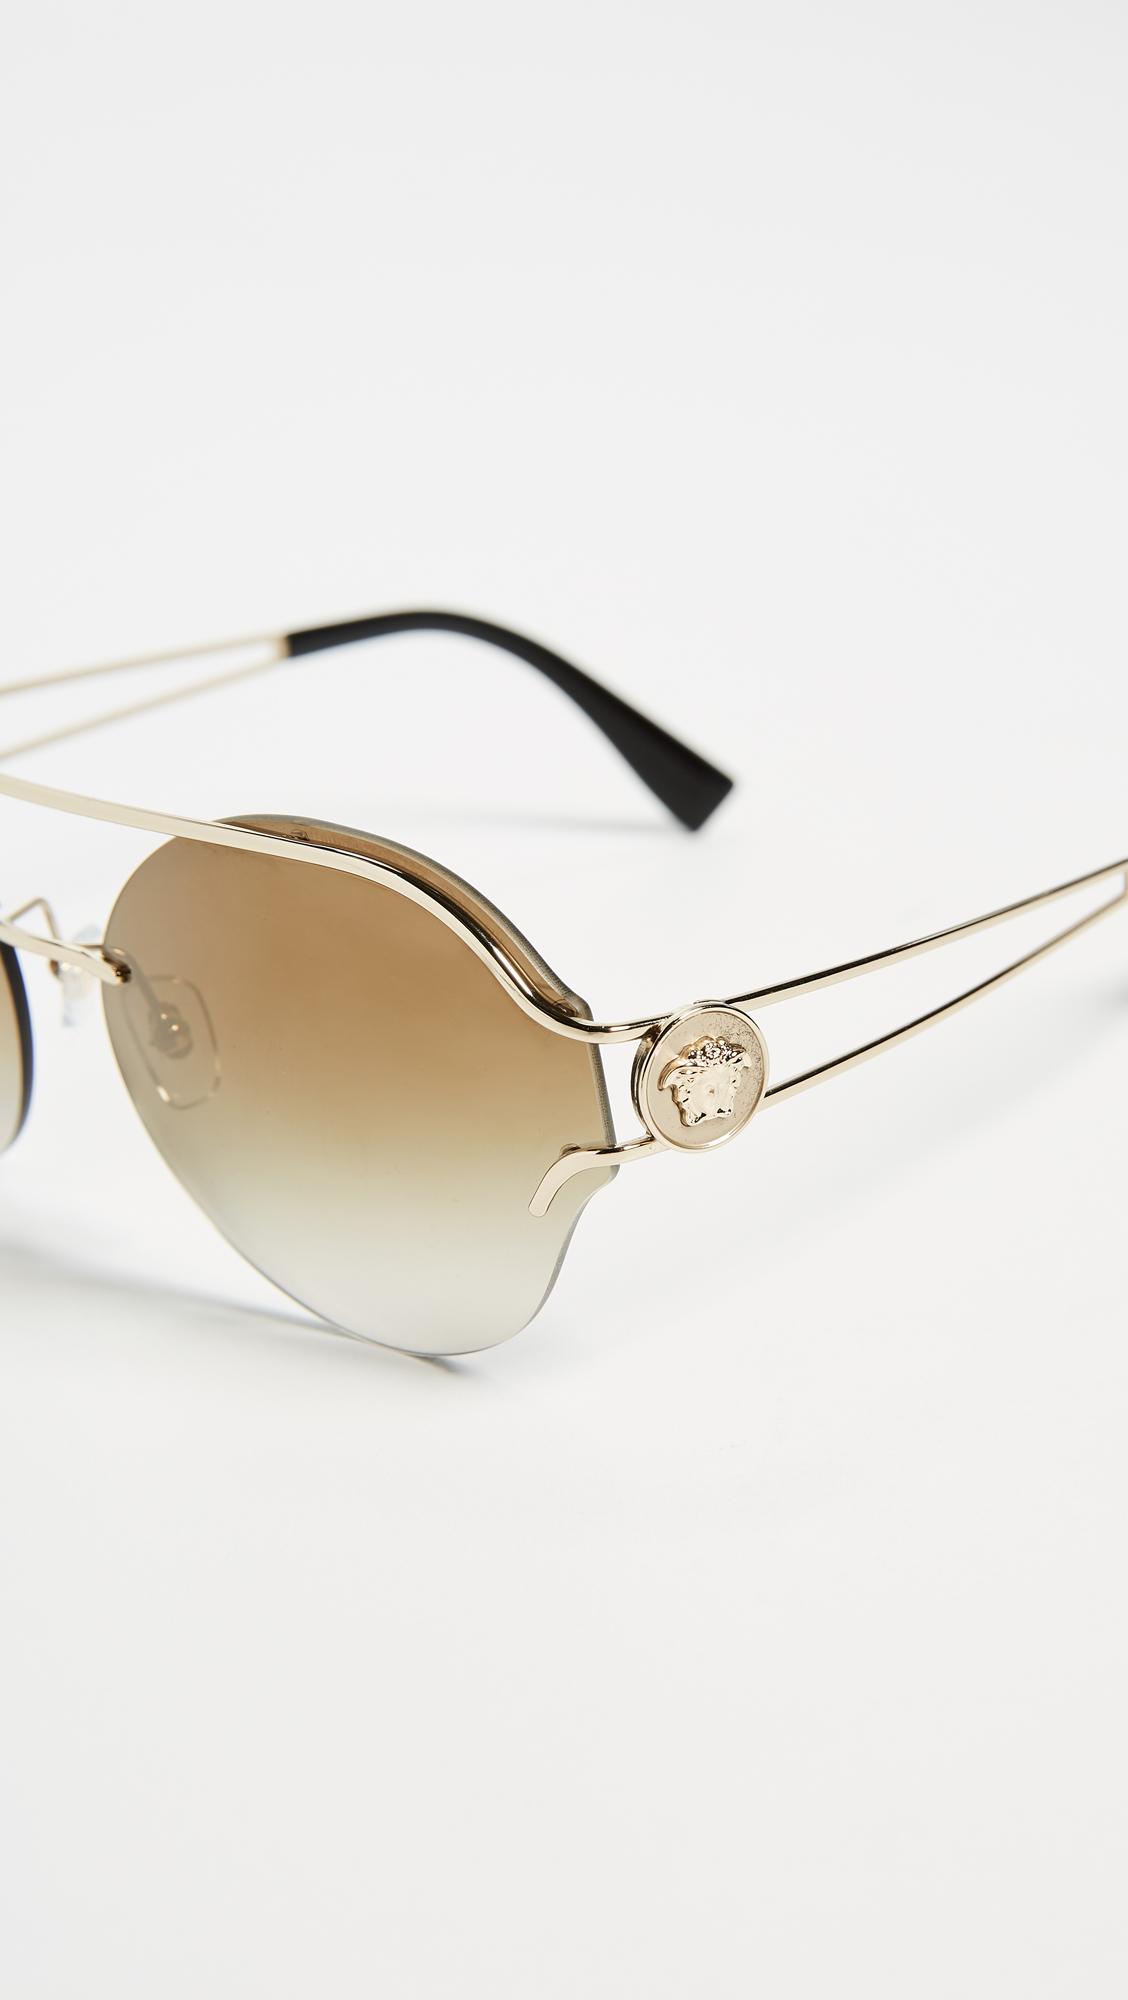 5b28604248c058 Versace VE2184 Medusa Visor Round Sunglasses